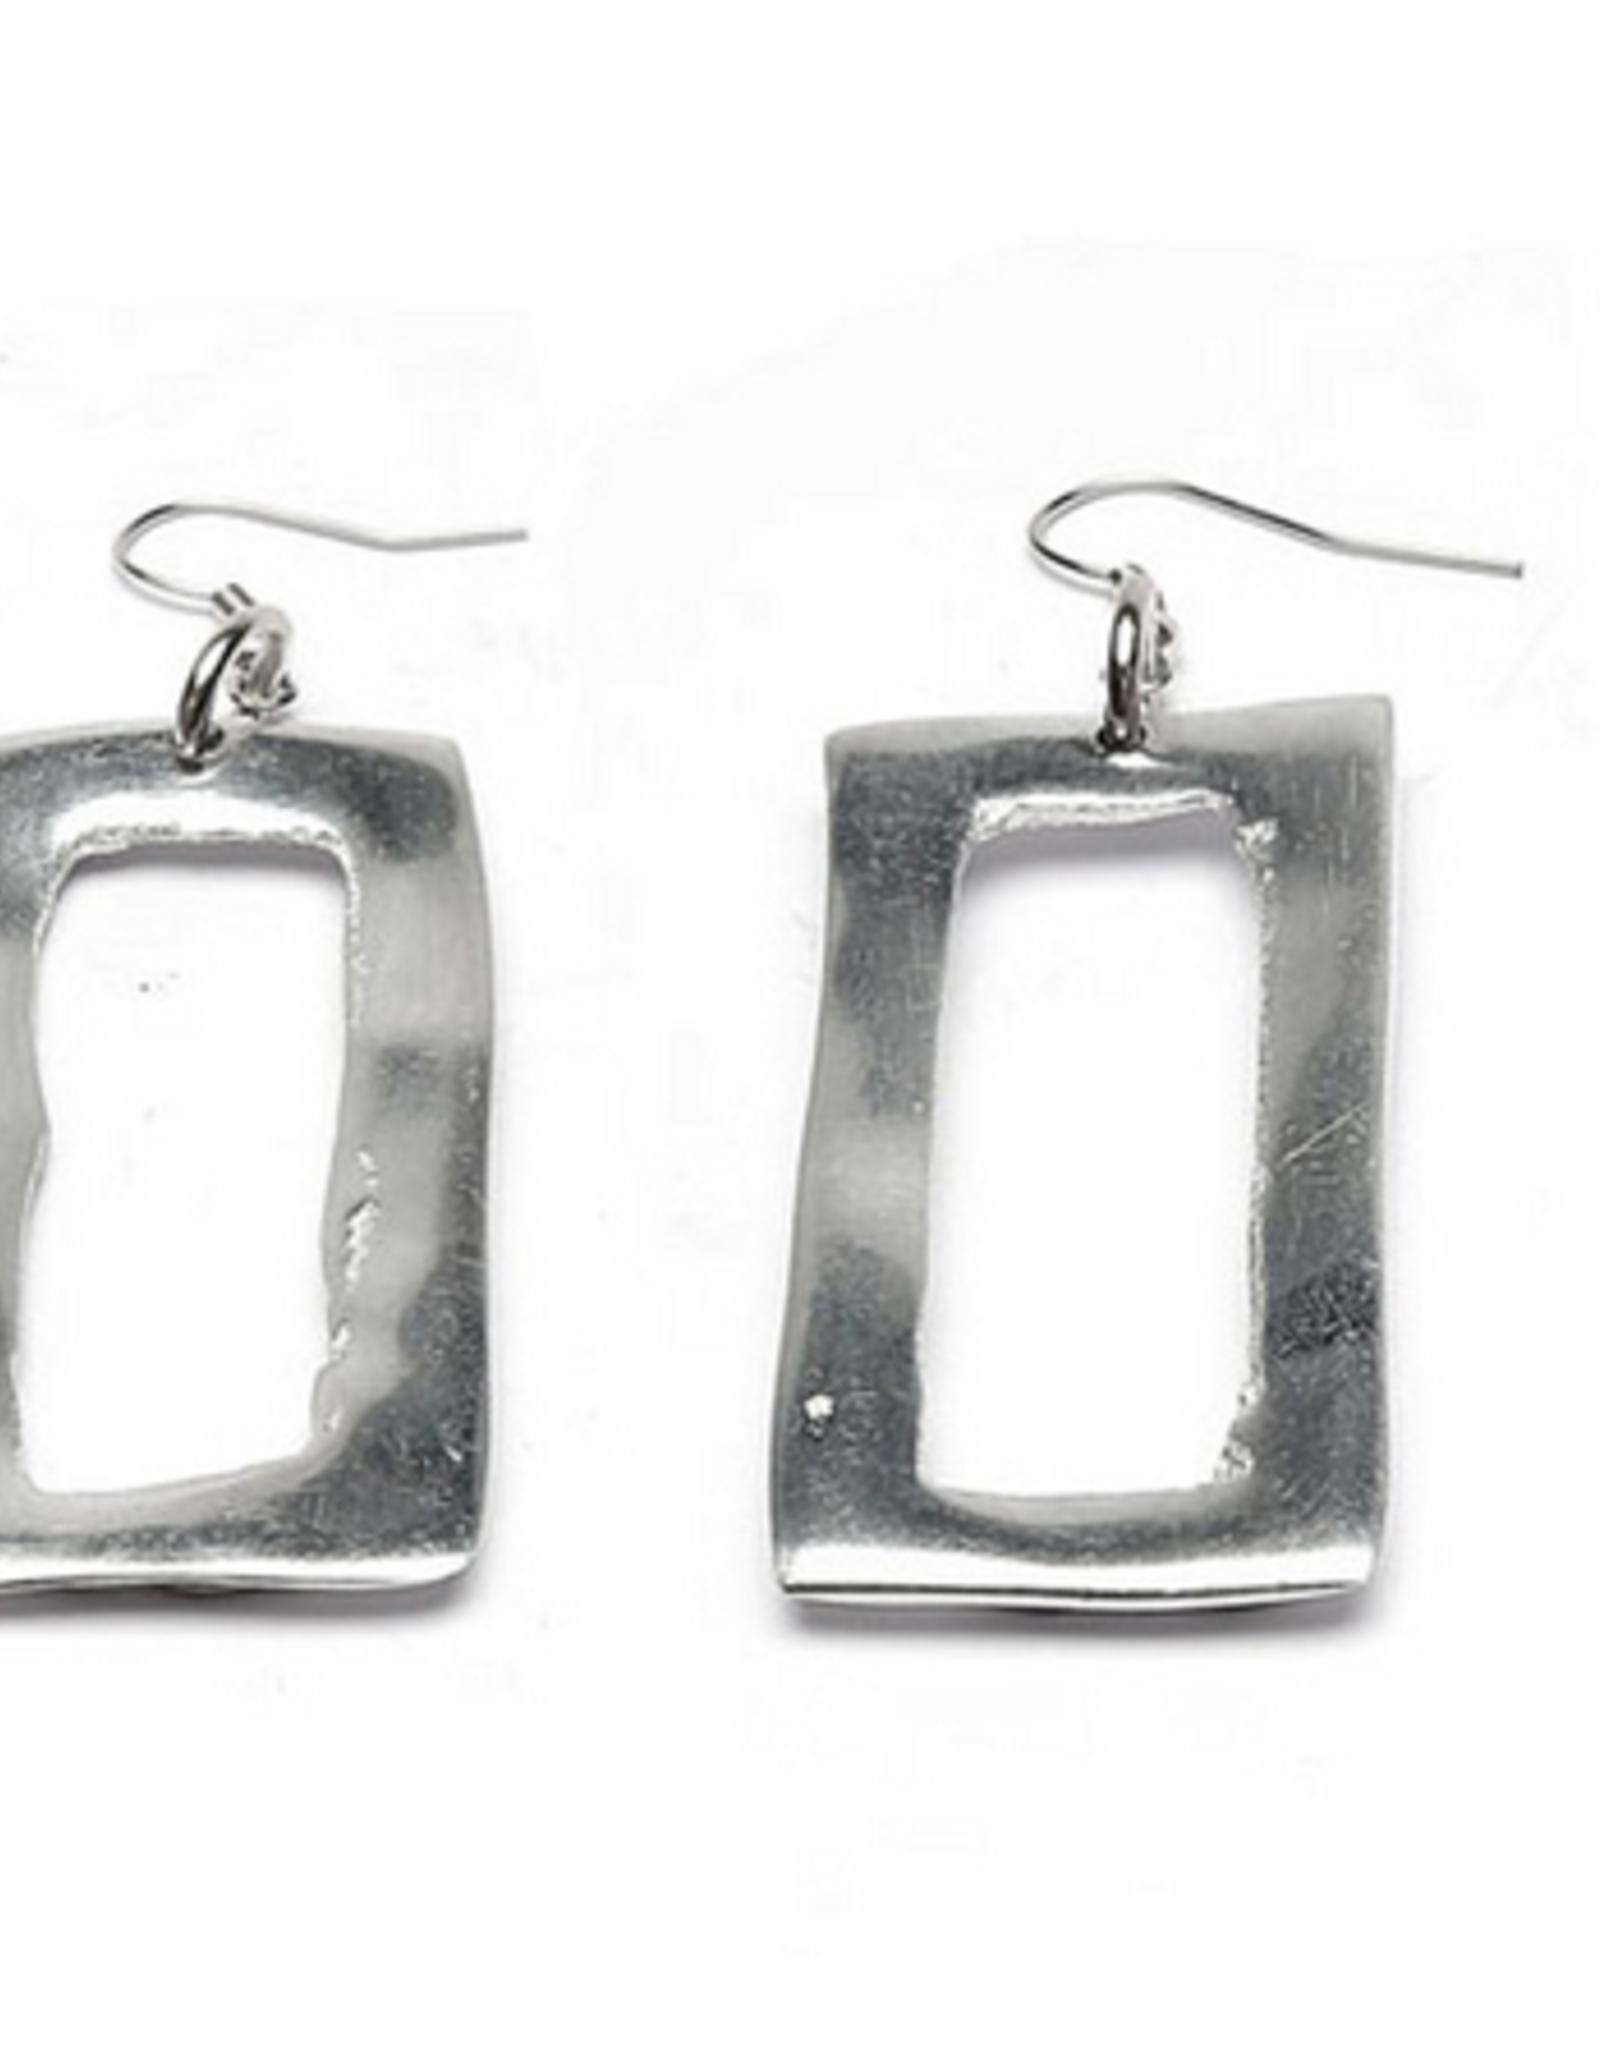 VESTOPAZZO Aluminum Rectangle Earrings